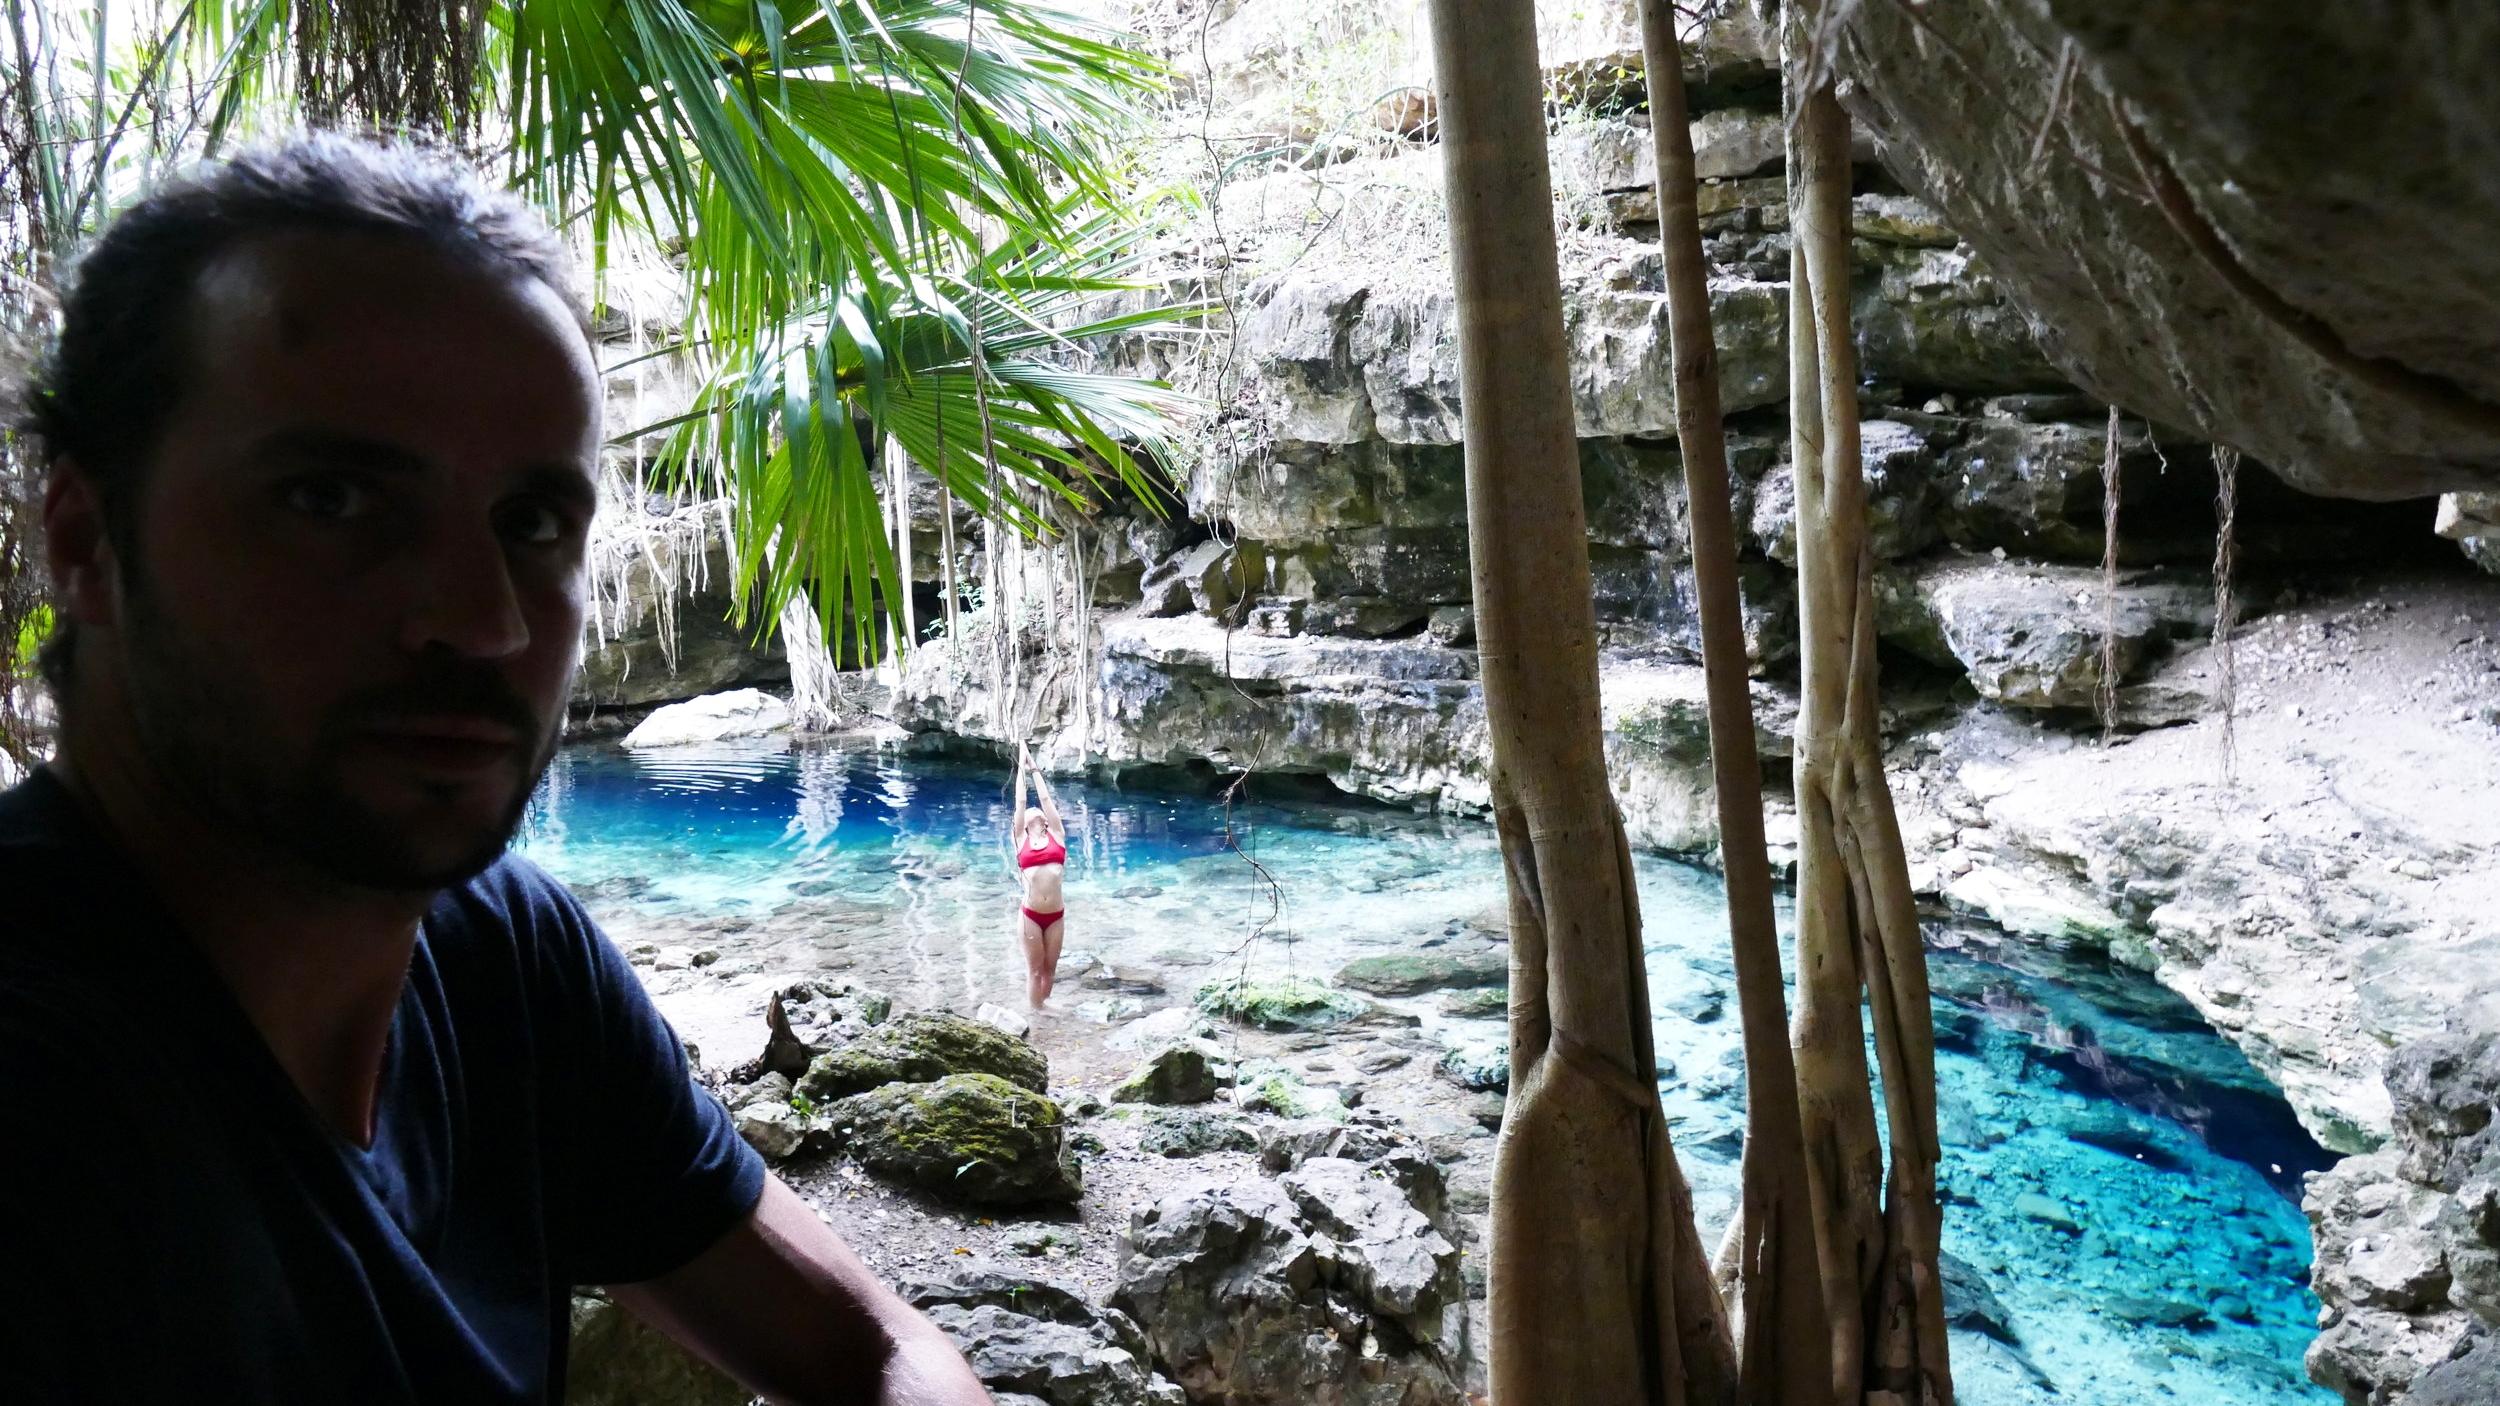 Cenote Xbatun Mexico (102).JPG